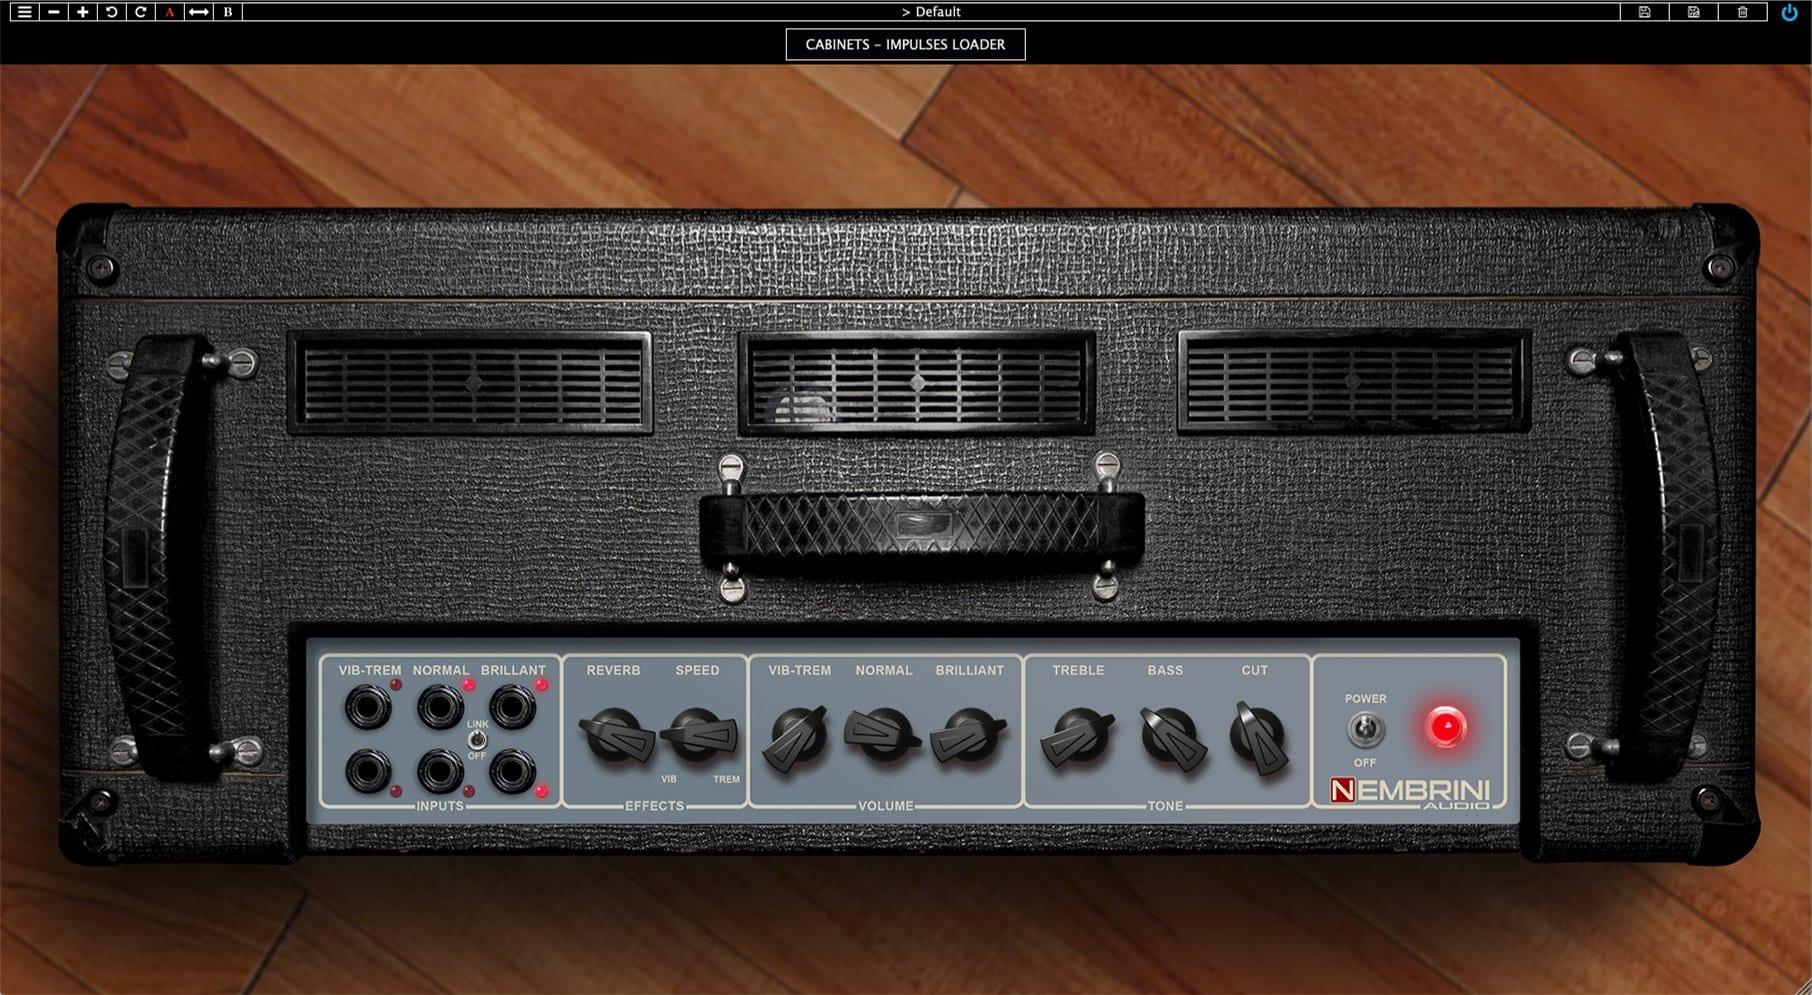 Nembrini Audio Voice DC30 Valve Guitar Amplifier